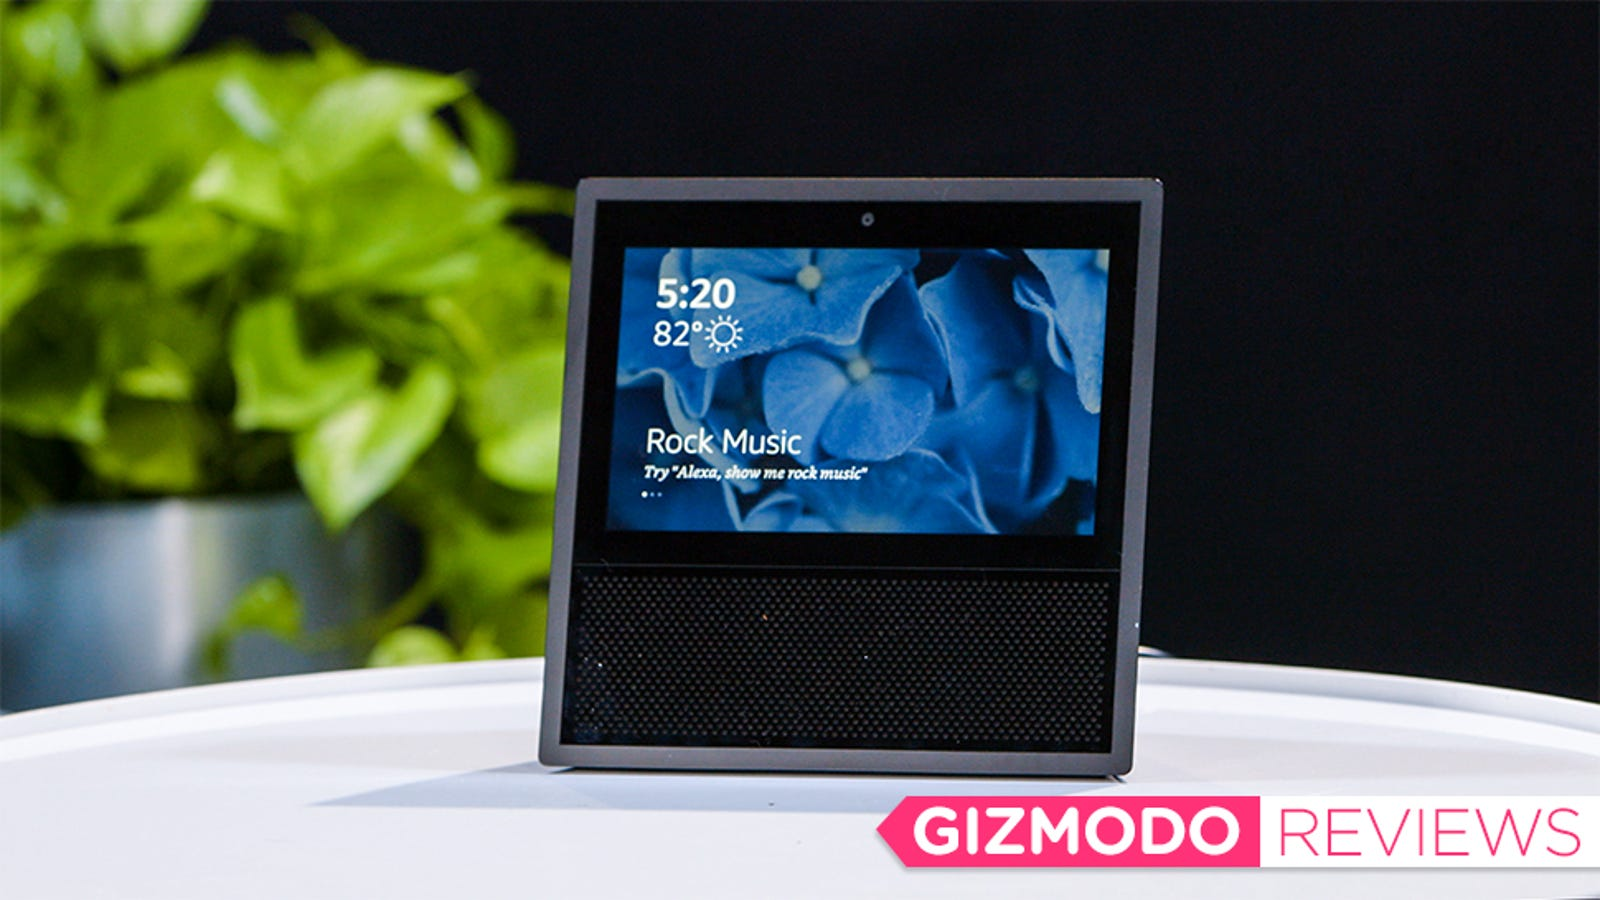 Gizmodo Image